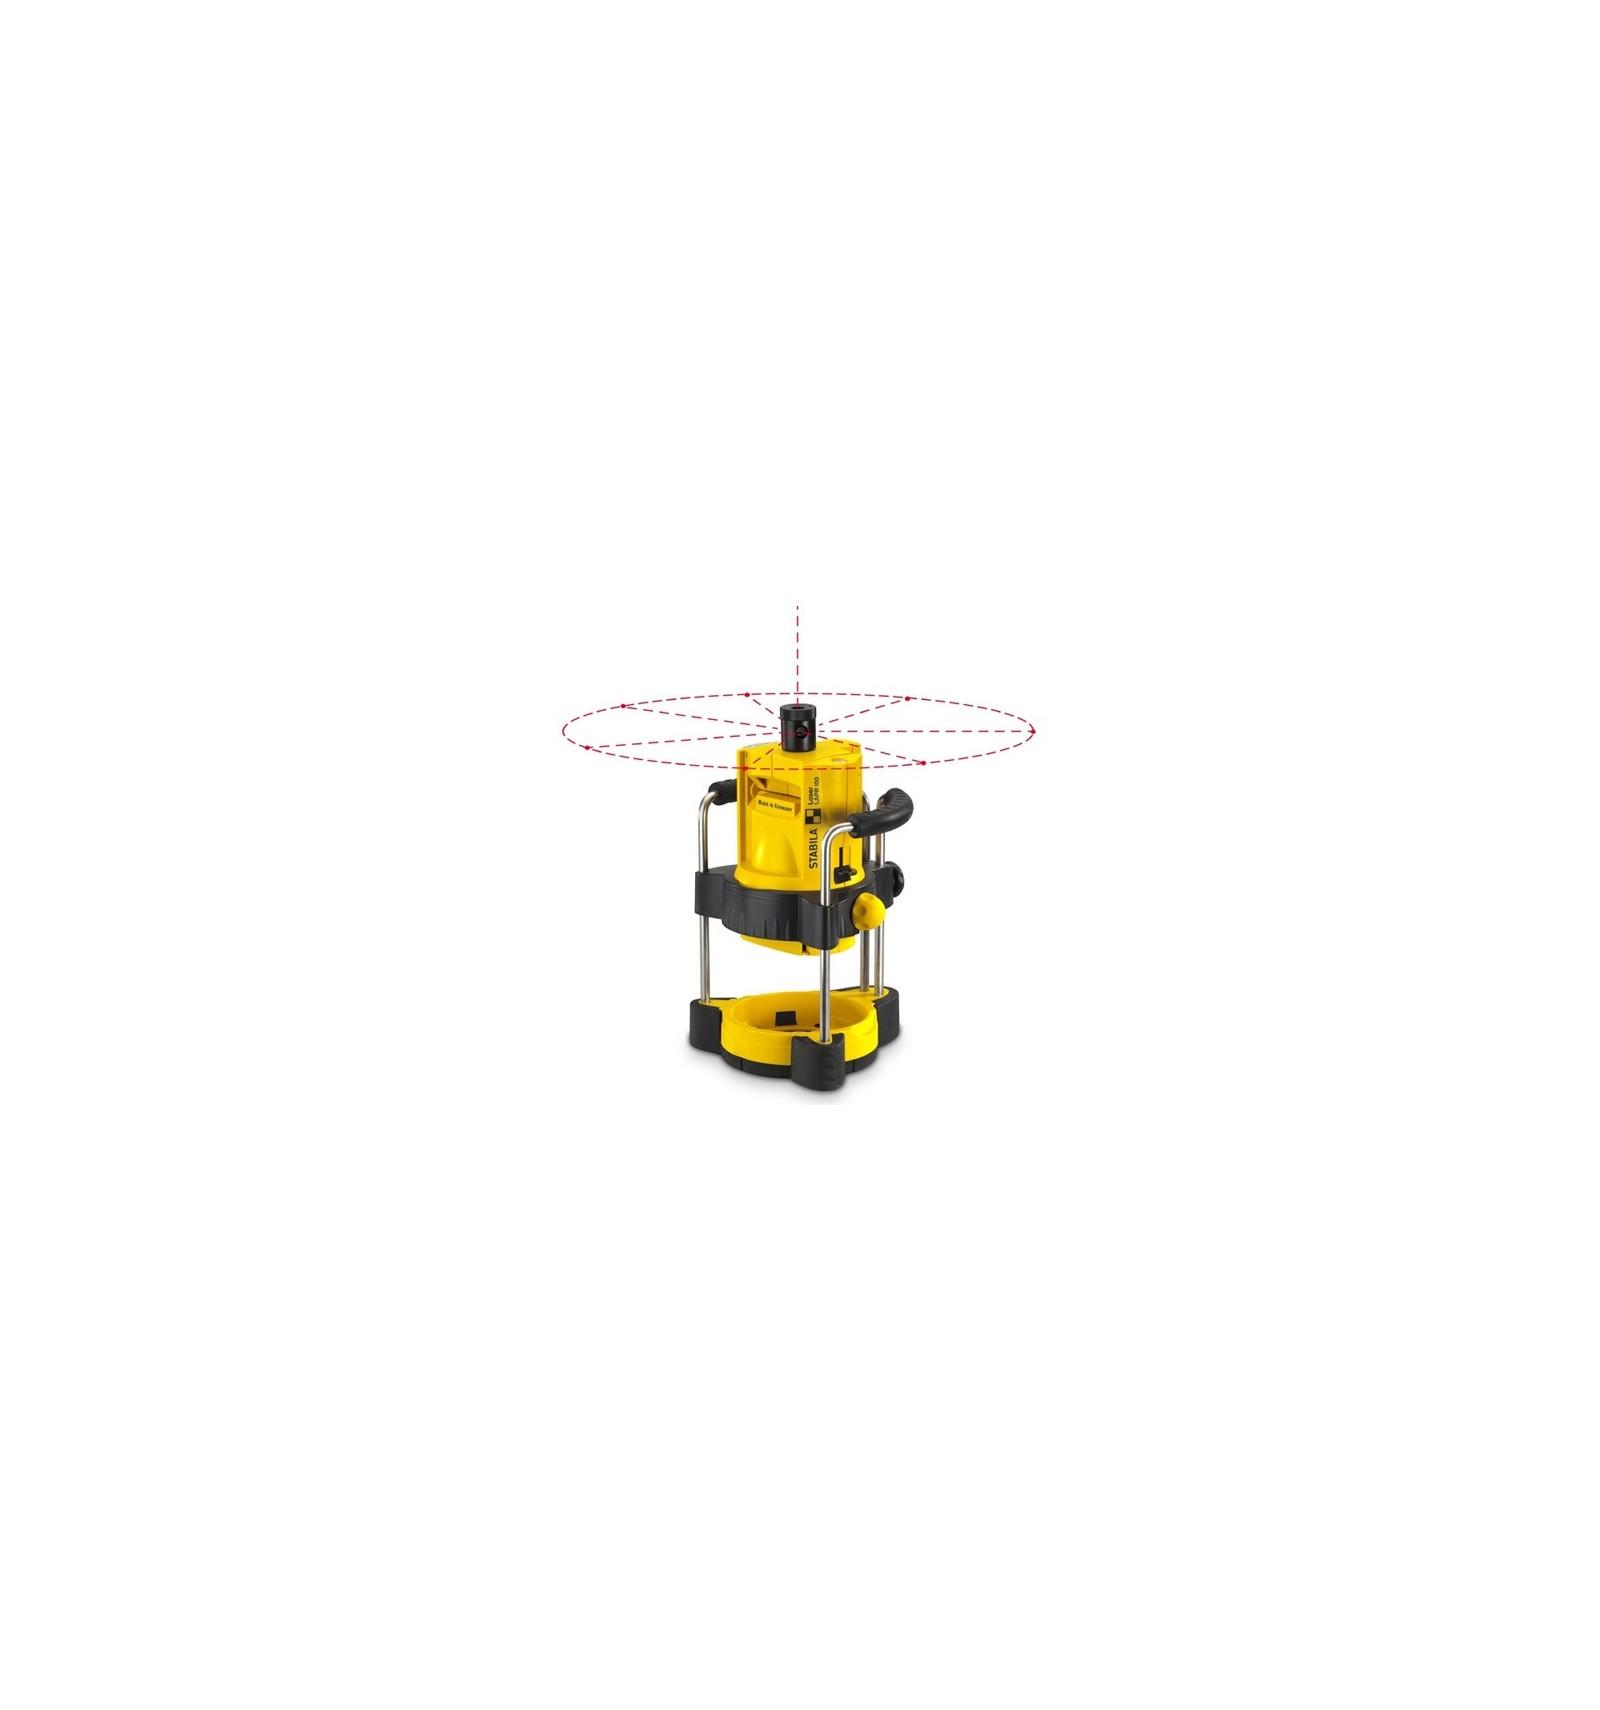 Lapr 100 nivel laser autonivelante giratorio lapr 100 for Nivel laser autonivelante